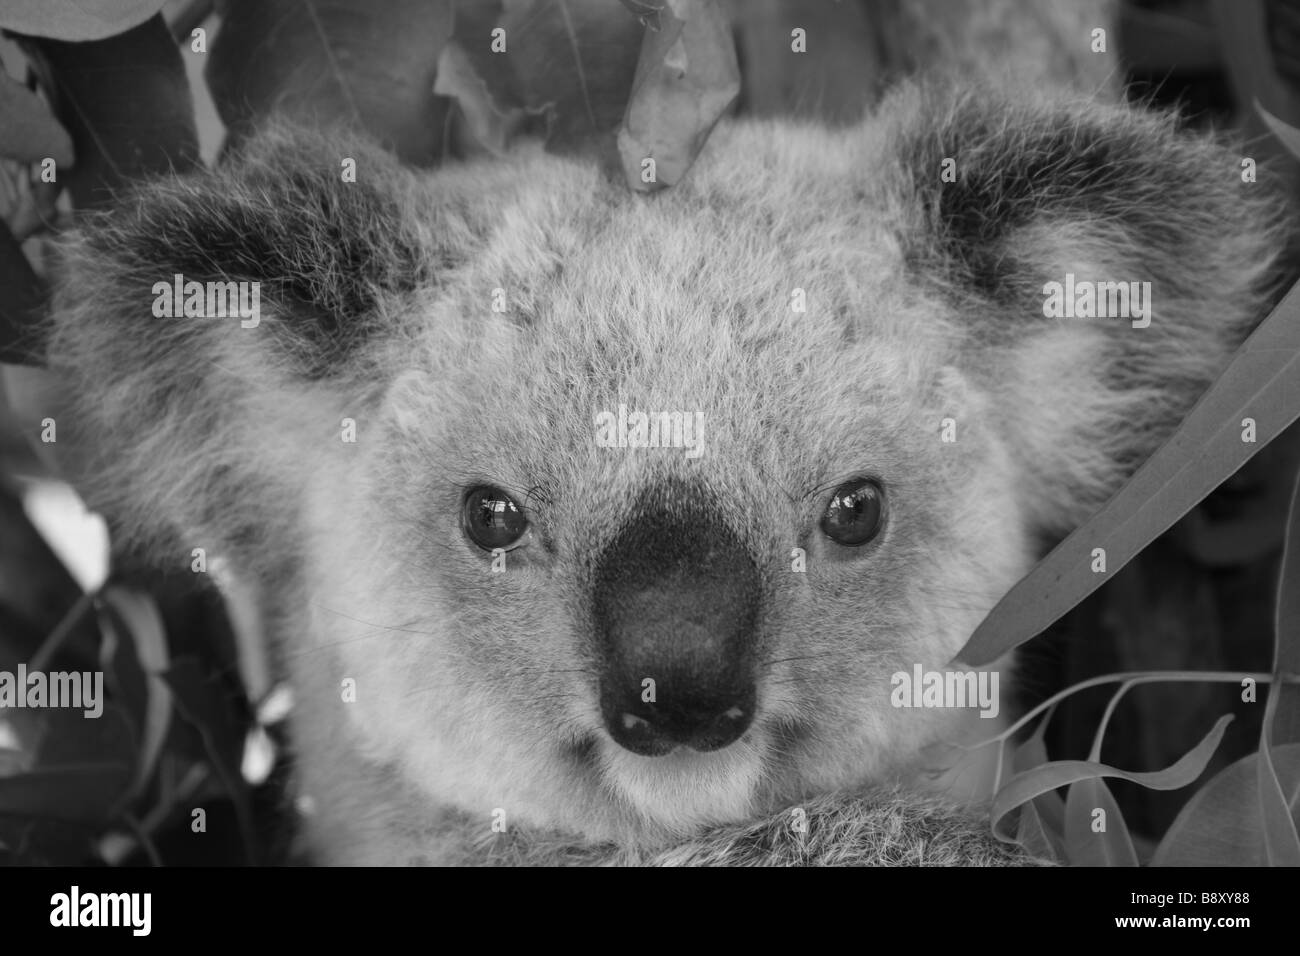 A monochrome portrait of a Koala joey - Stock Image